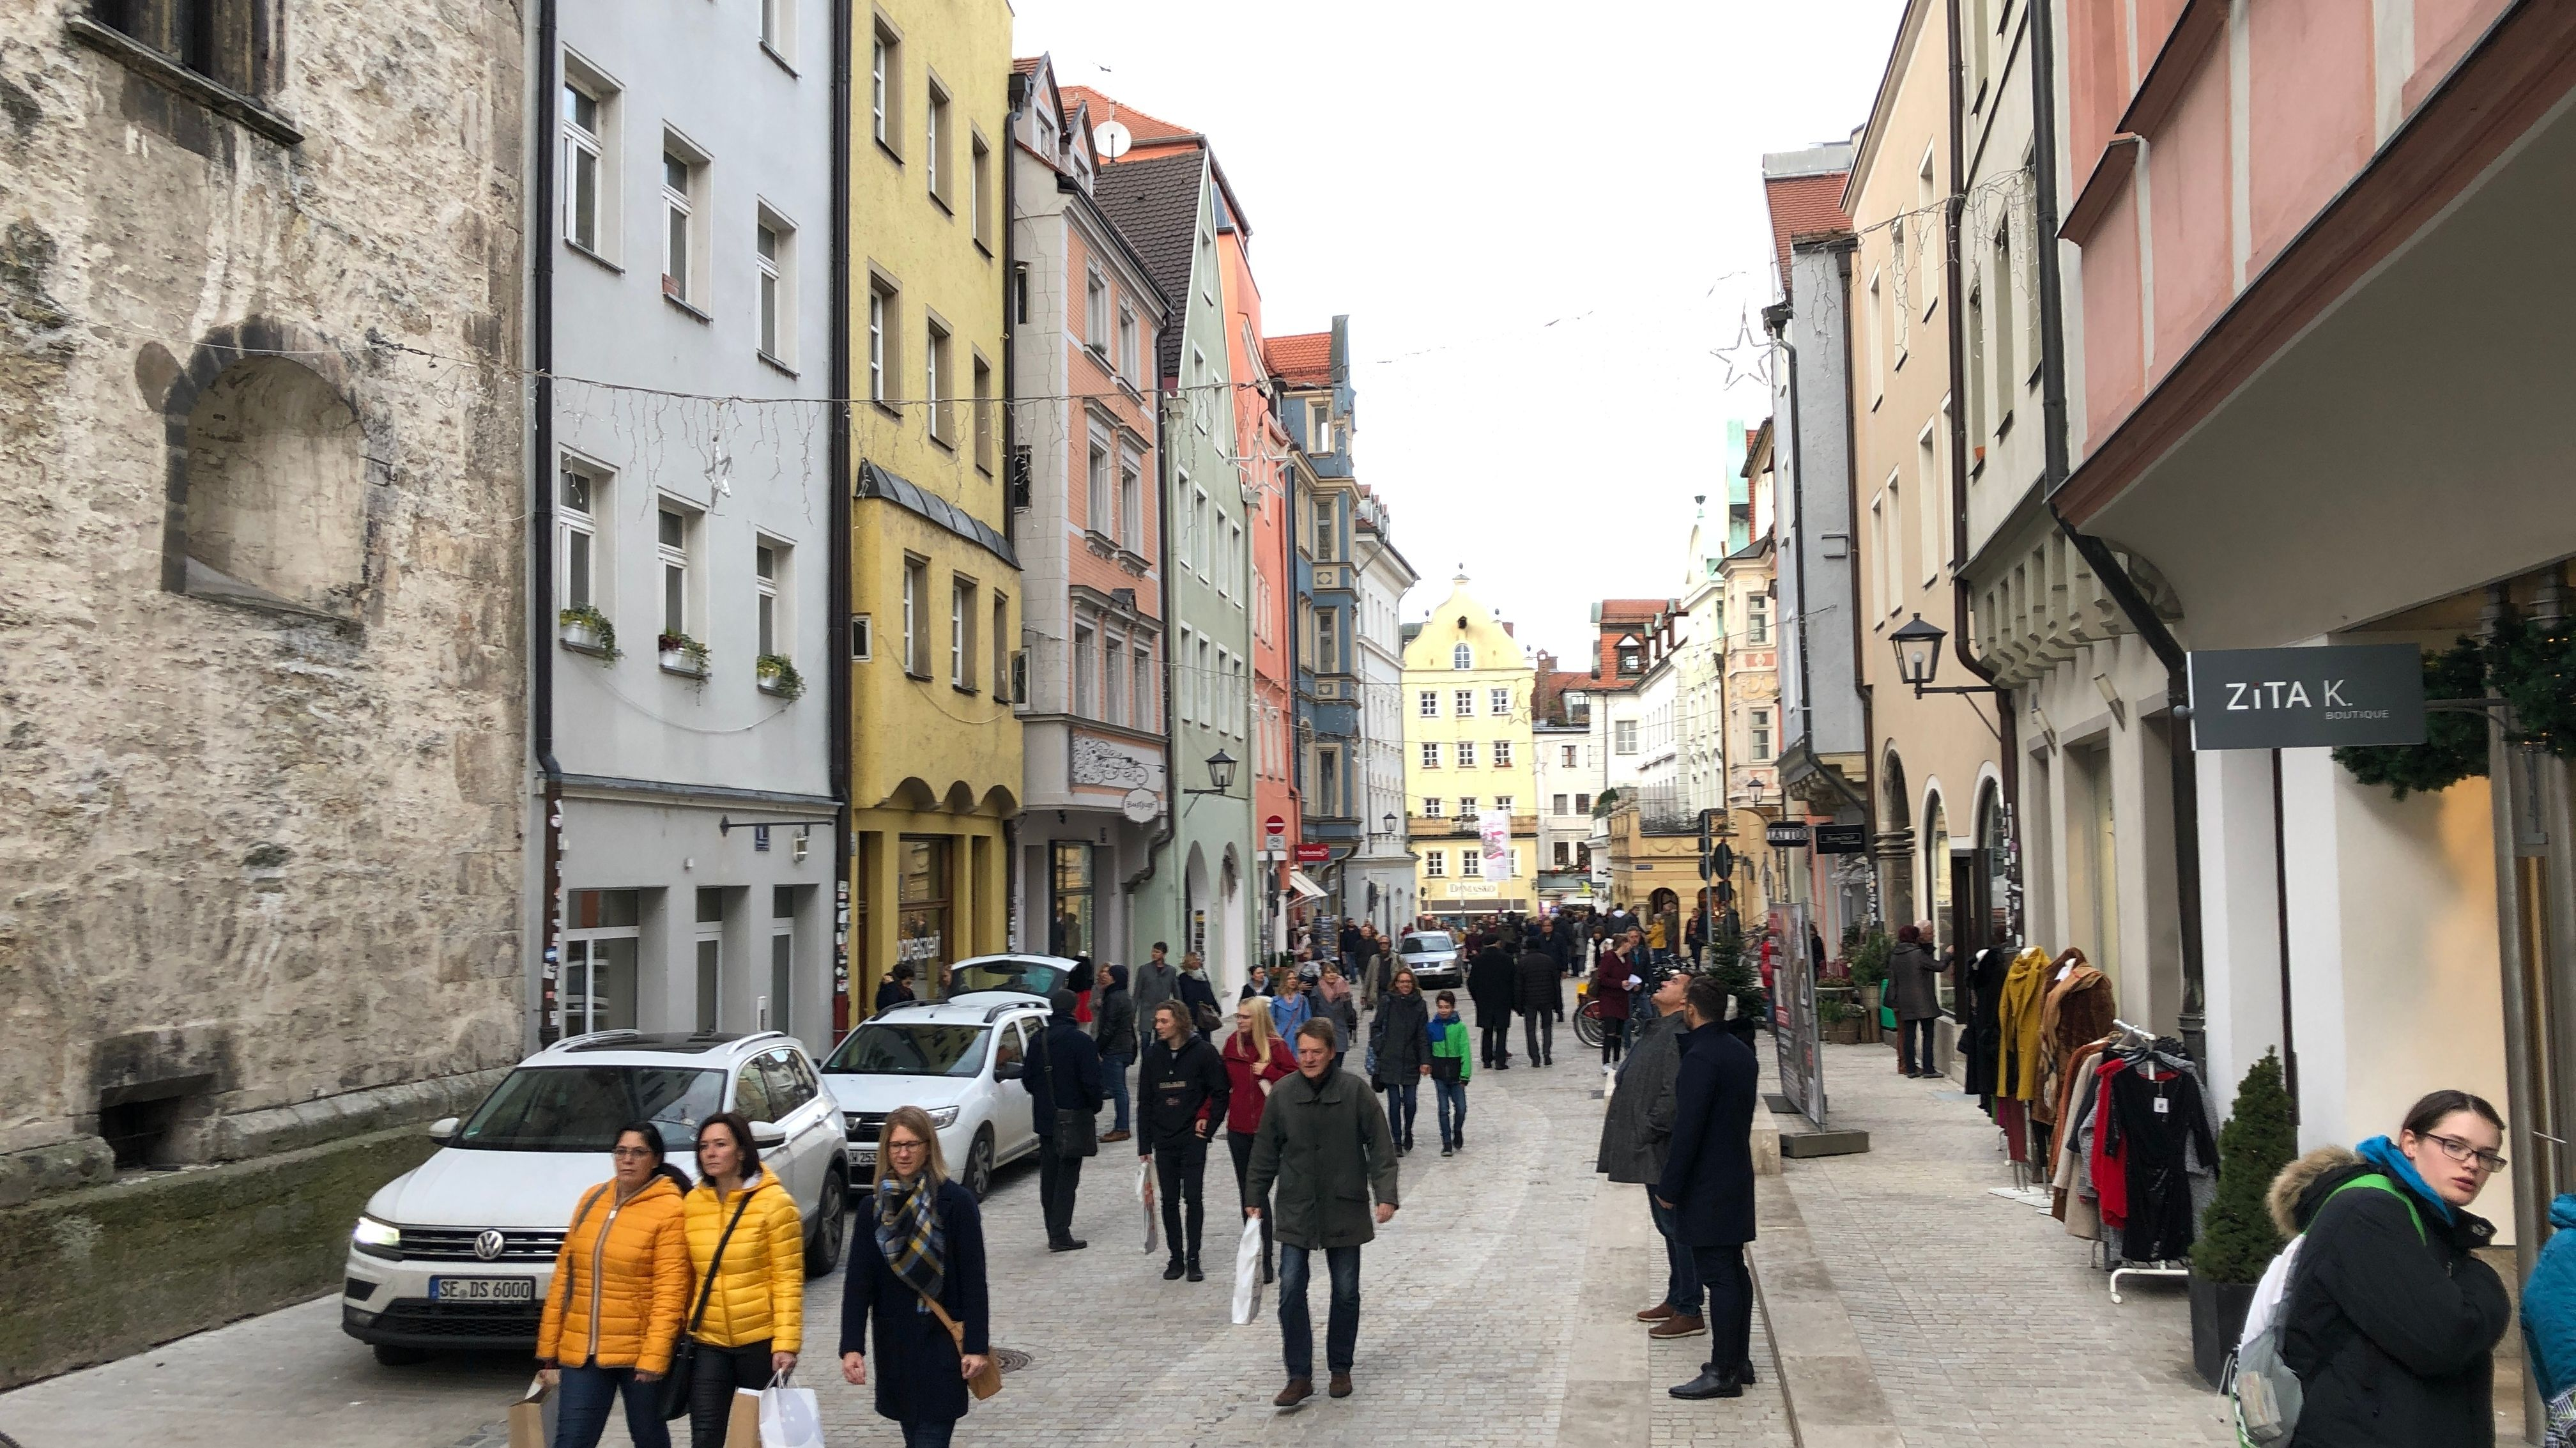 Neue Regensburger Fußgängerzone in der Altstadt.